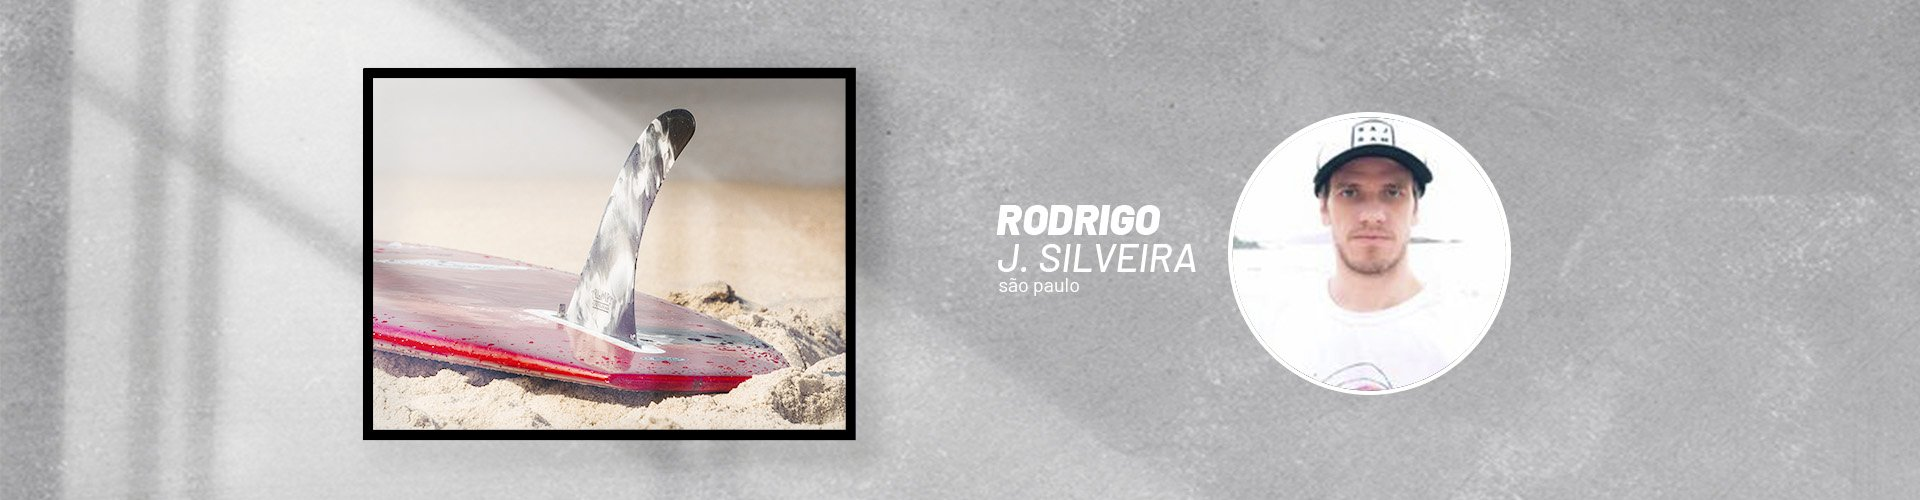 Página Artista | Rodrigo J. Silveira